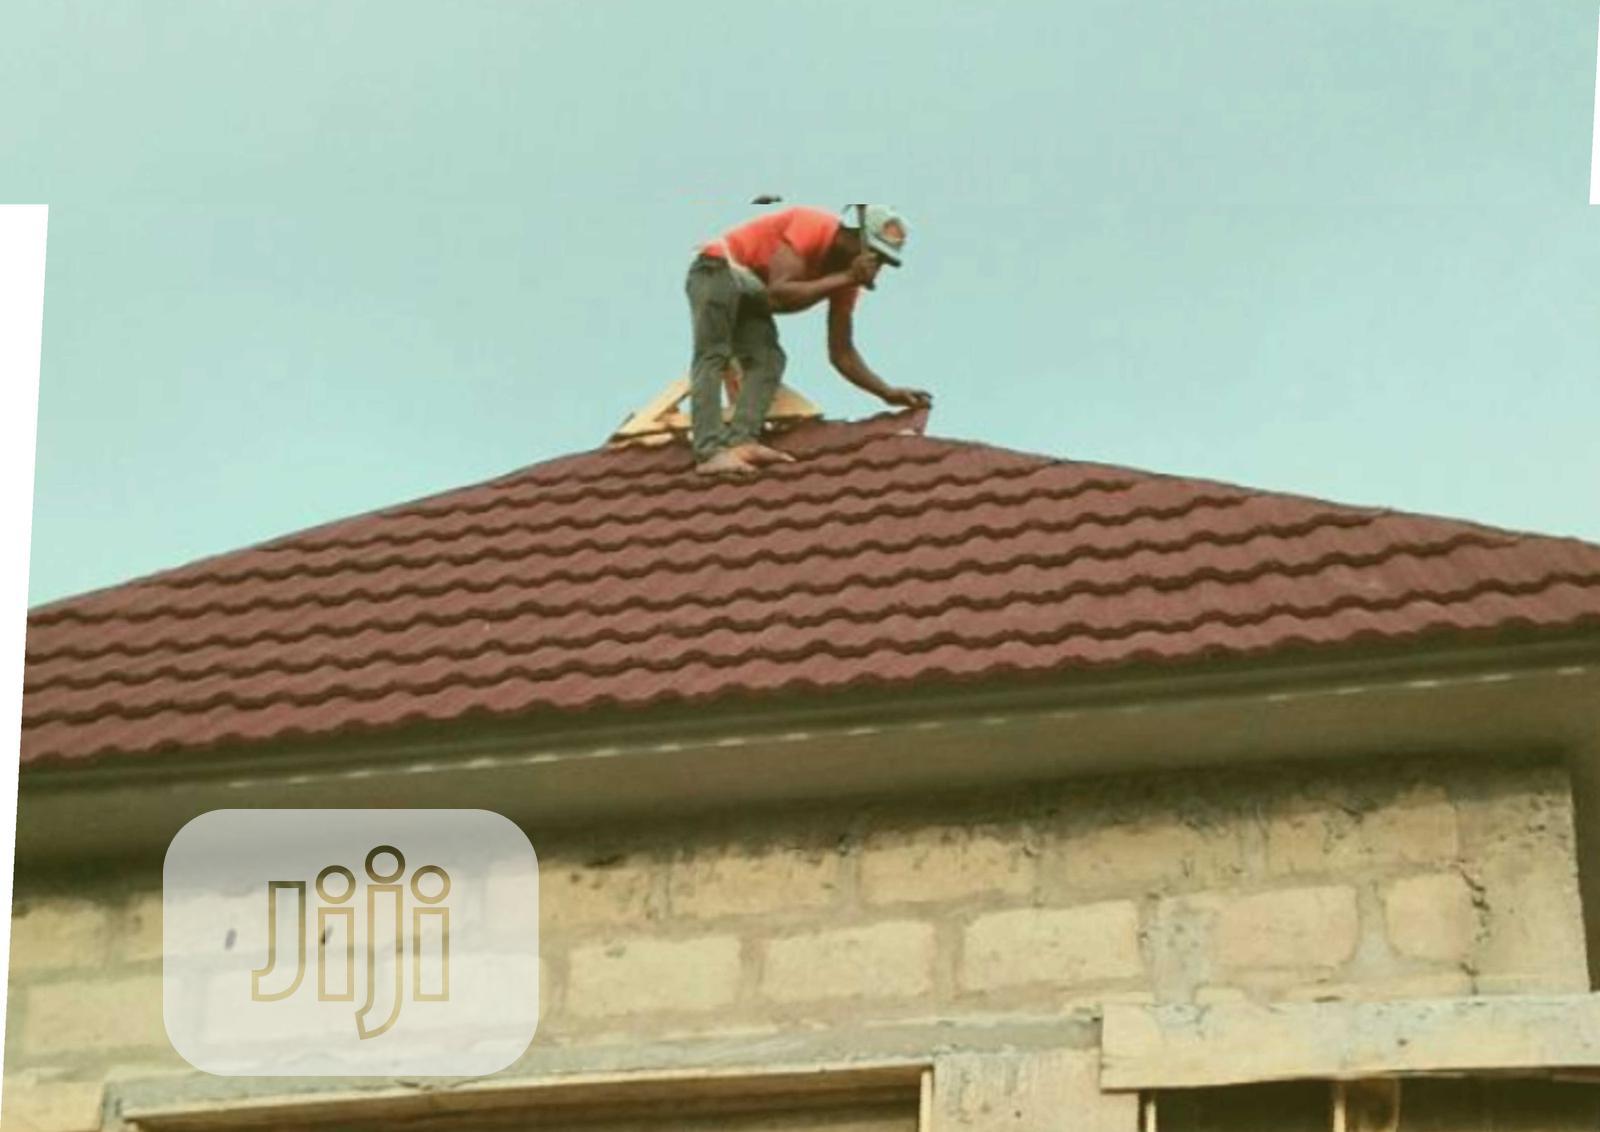 Original Gerard Metro Roofing Tiles & Rain Gutter Heritage